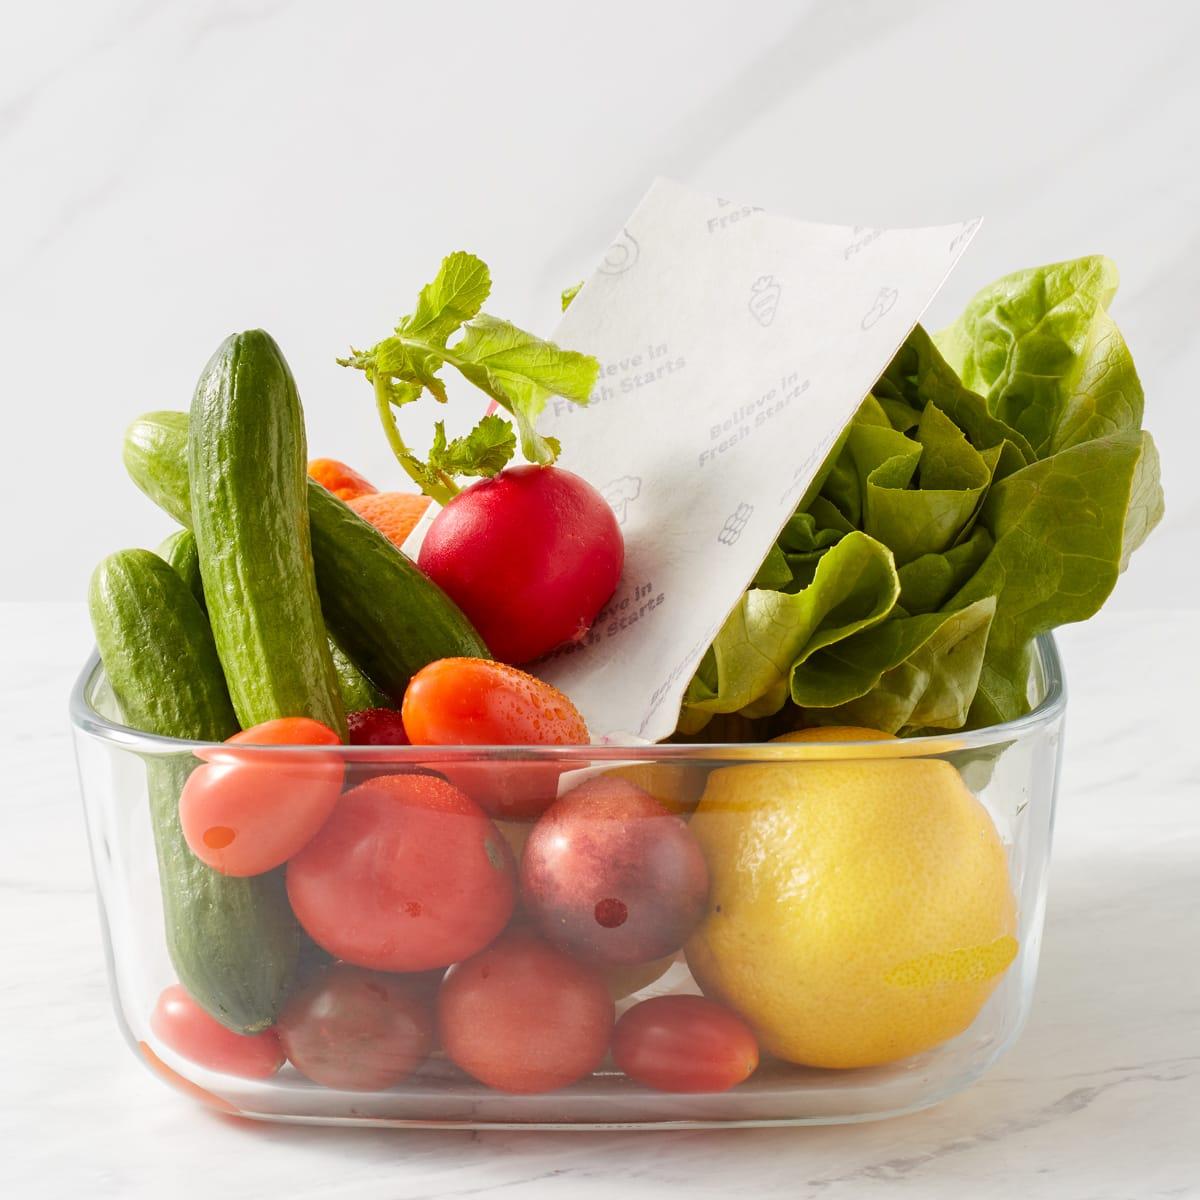 WW FRESHPAPER Food Saver Sheets - alternate view 2